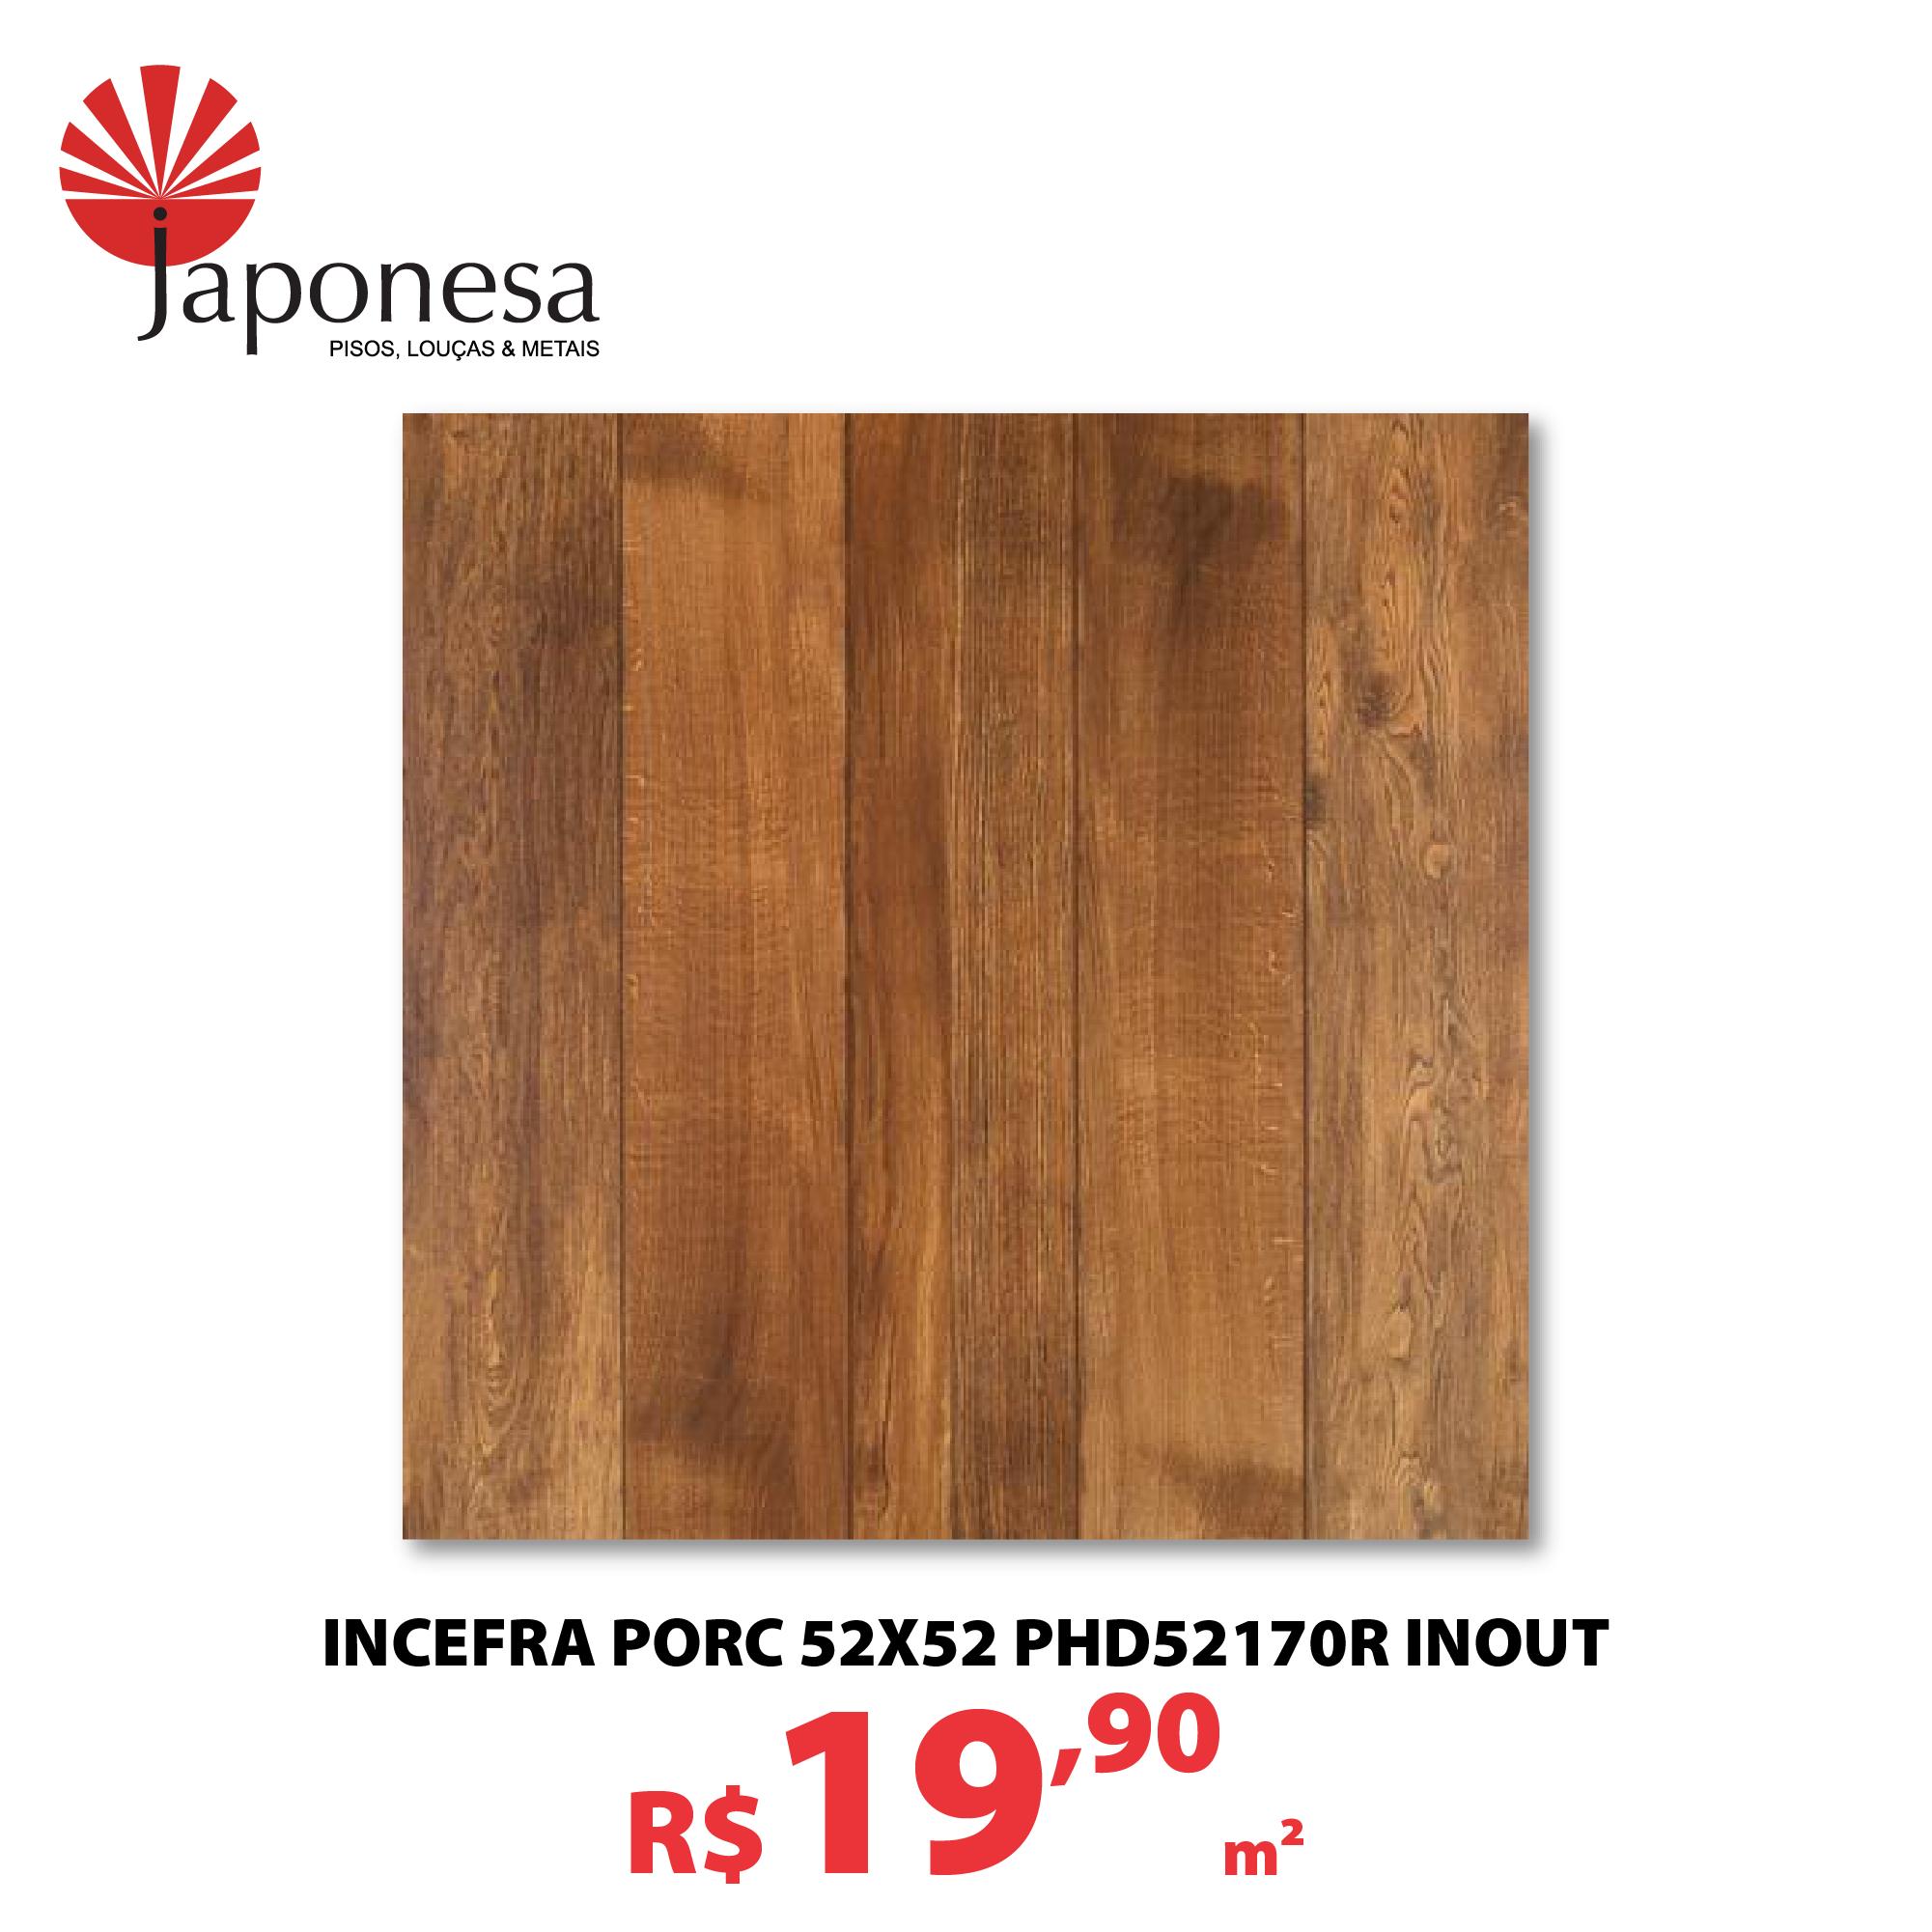 INCEFRA PORC 52X52 PHD52170R INOUT